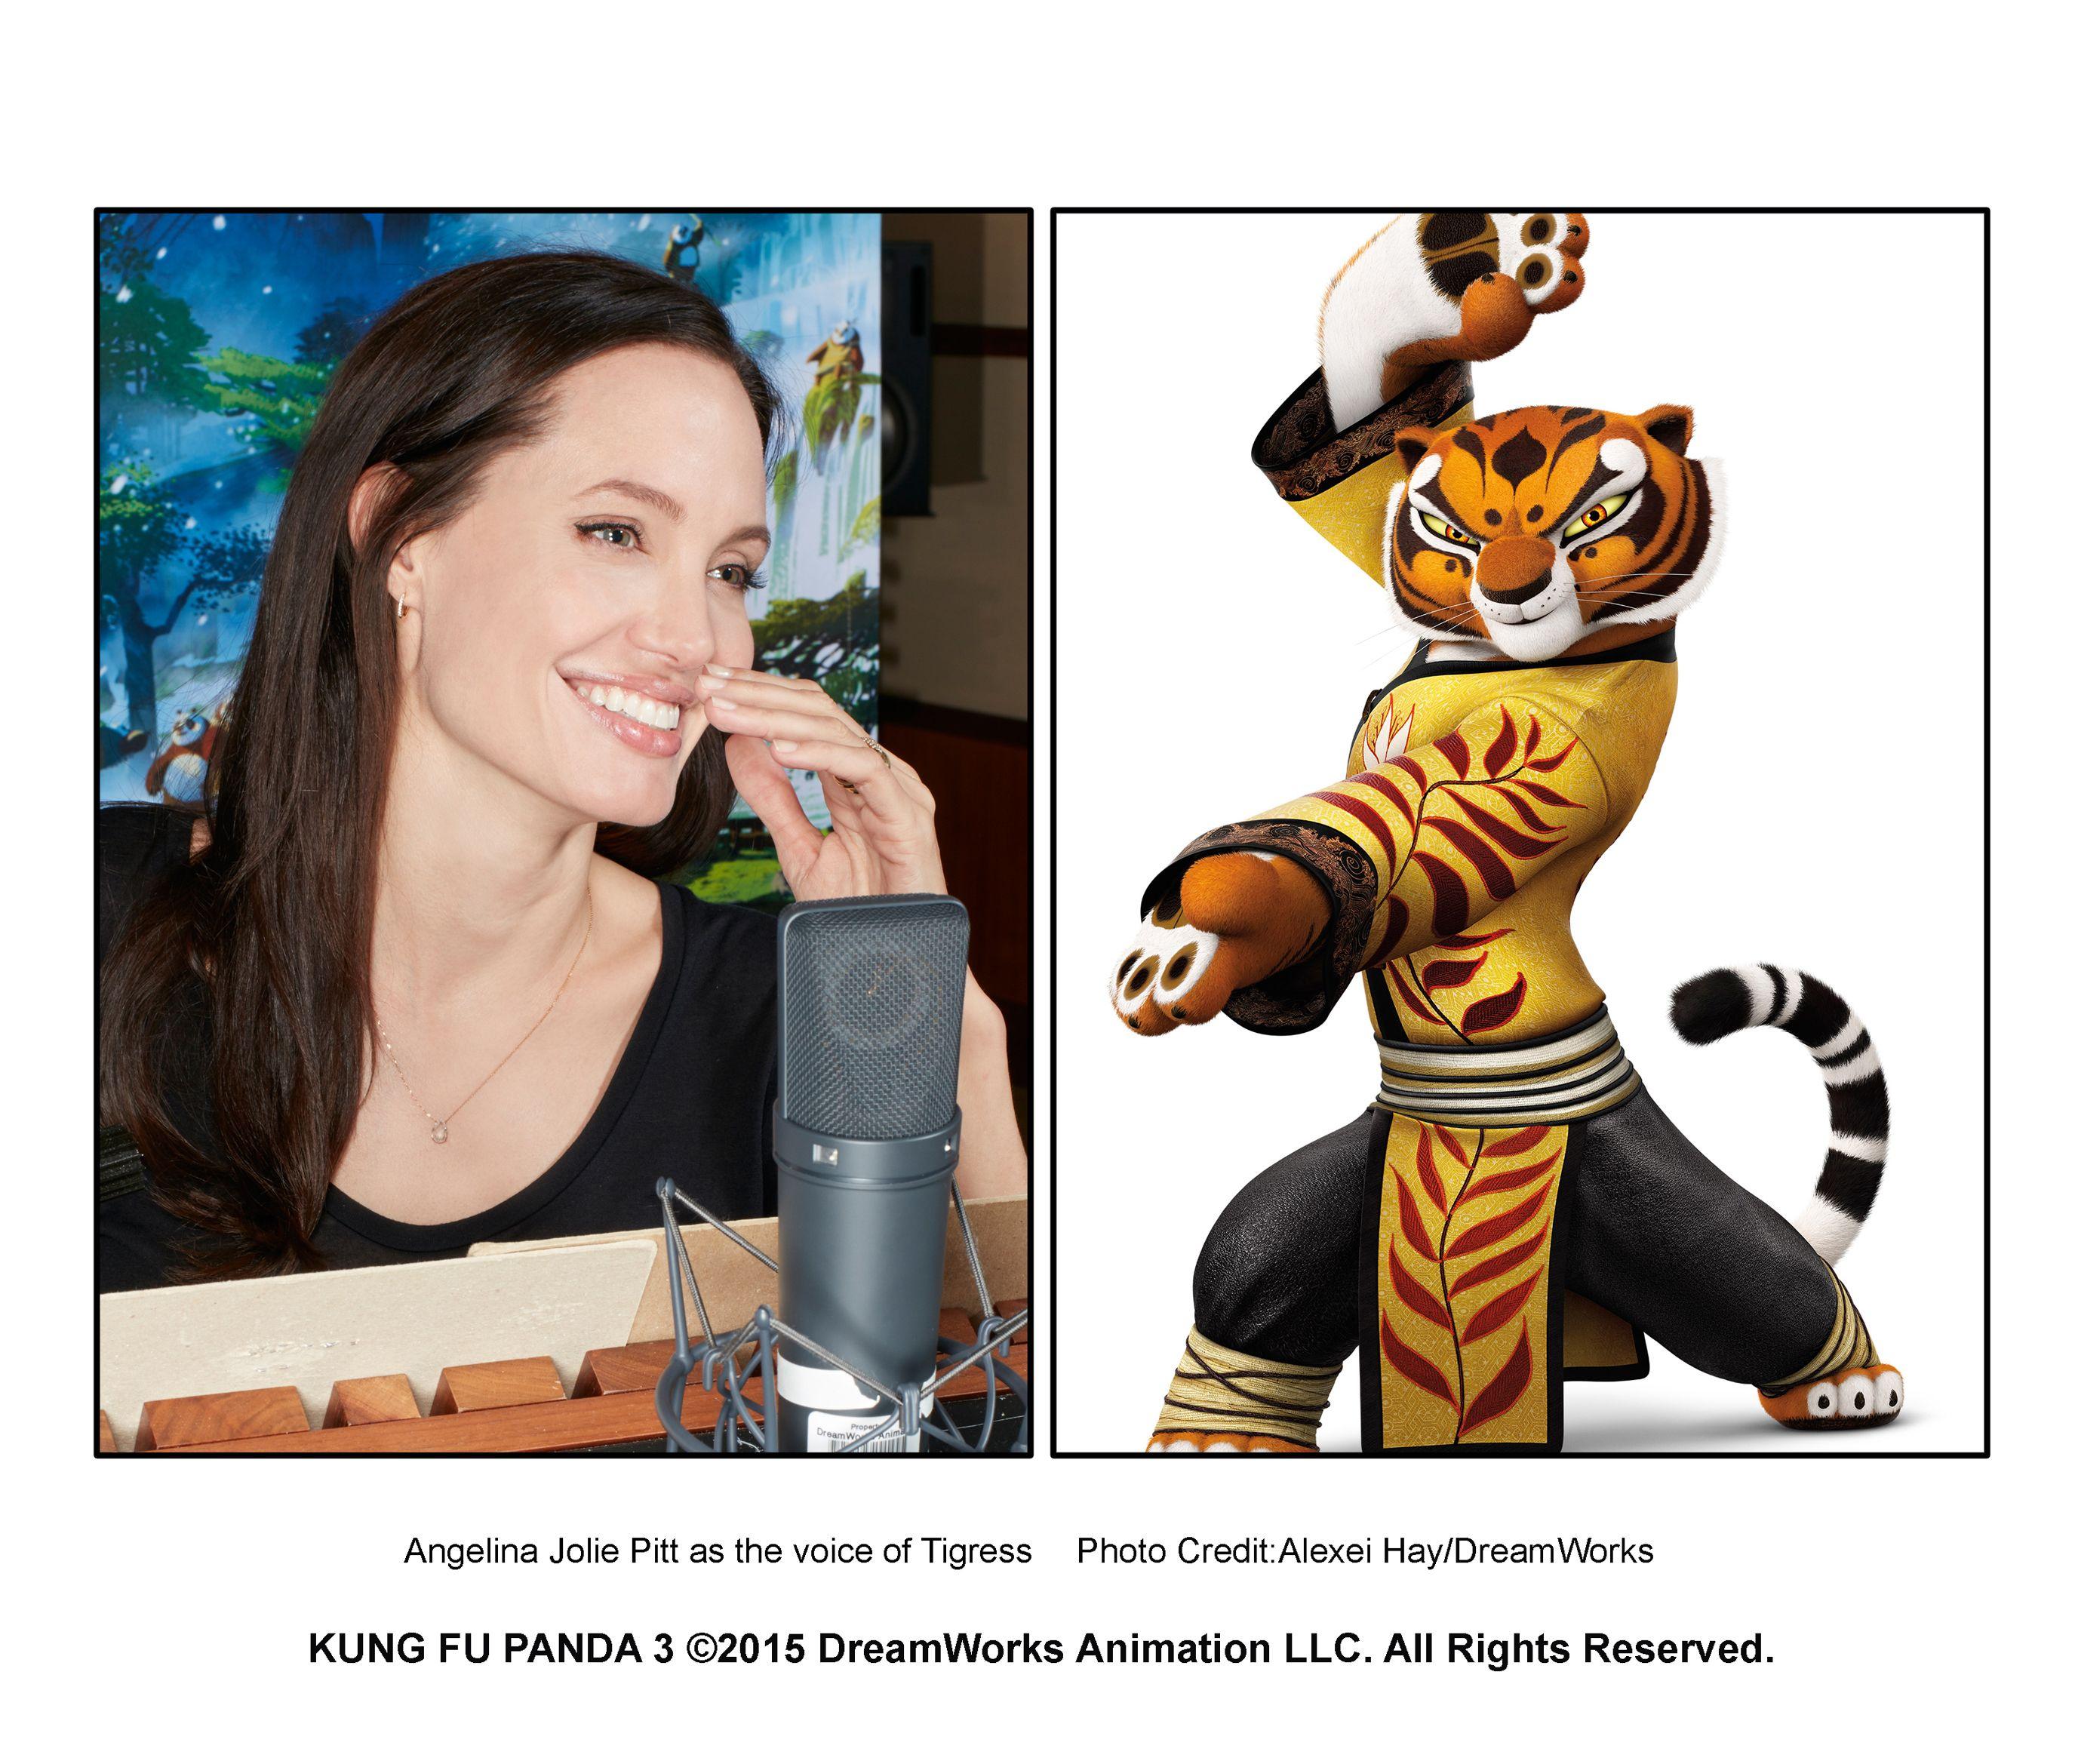 Kung Fu Panda 3 Promo Still 2015 Angelina Jolie As The Voice Of